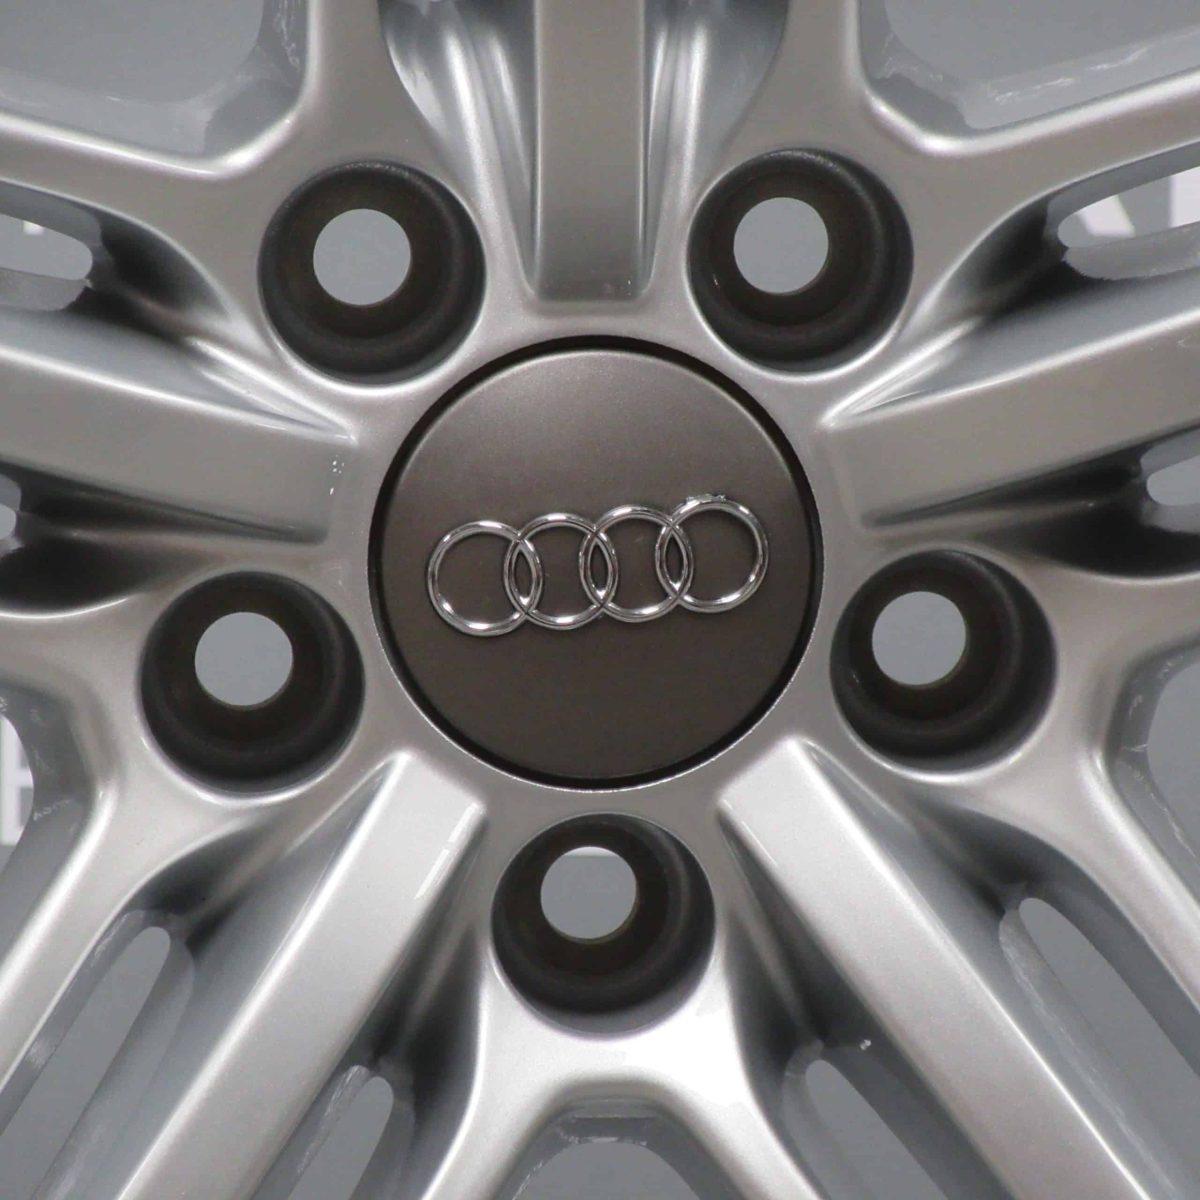 "Genuine Audi Q5 8R S-line Black Edition 5 Segment Spoke 20"" Inch Alloy Wheels with Silver Finish 8R0 601 025 BG"